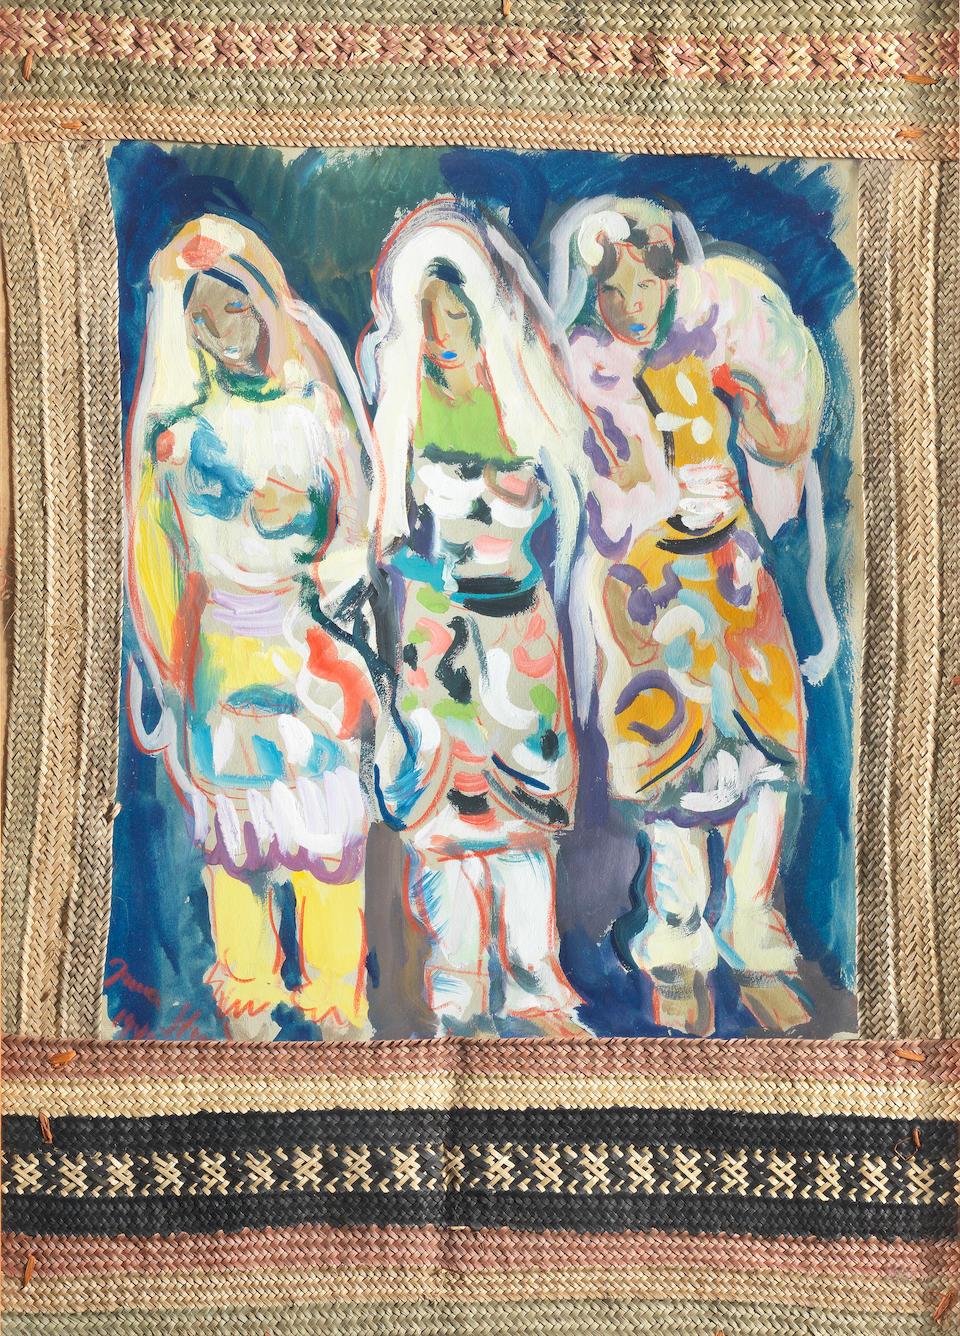 Irma Stern (South African, 1894-1966) Three Indian Women